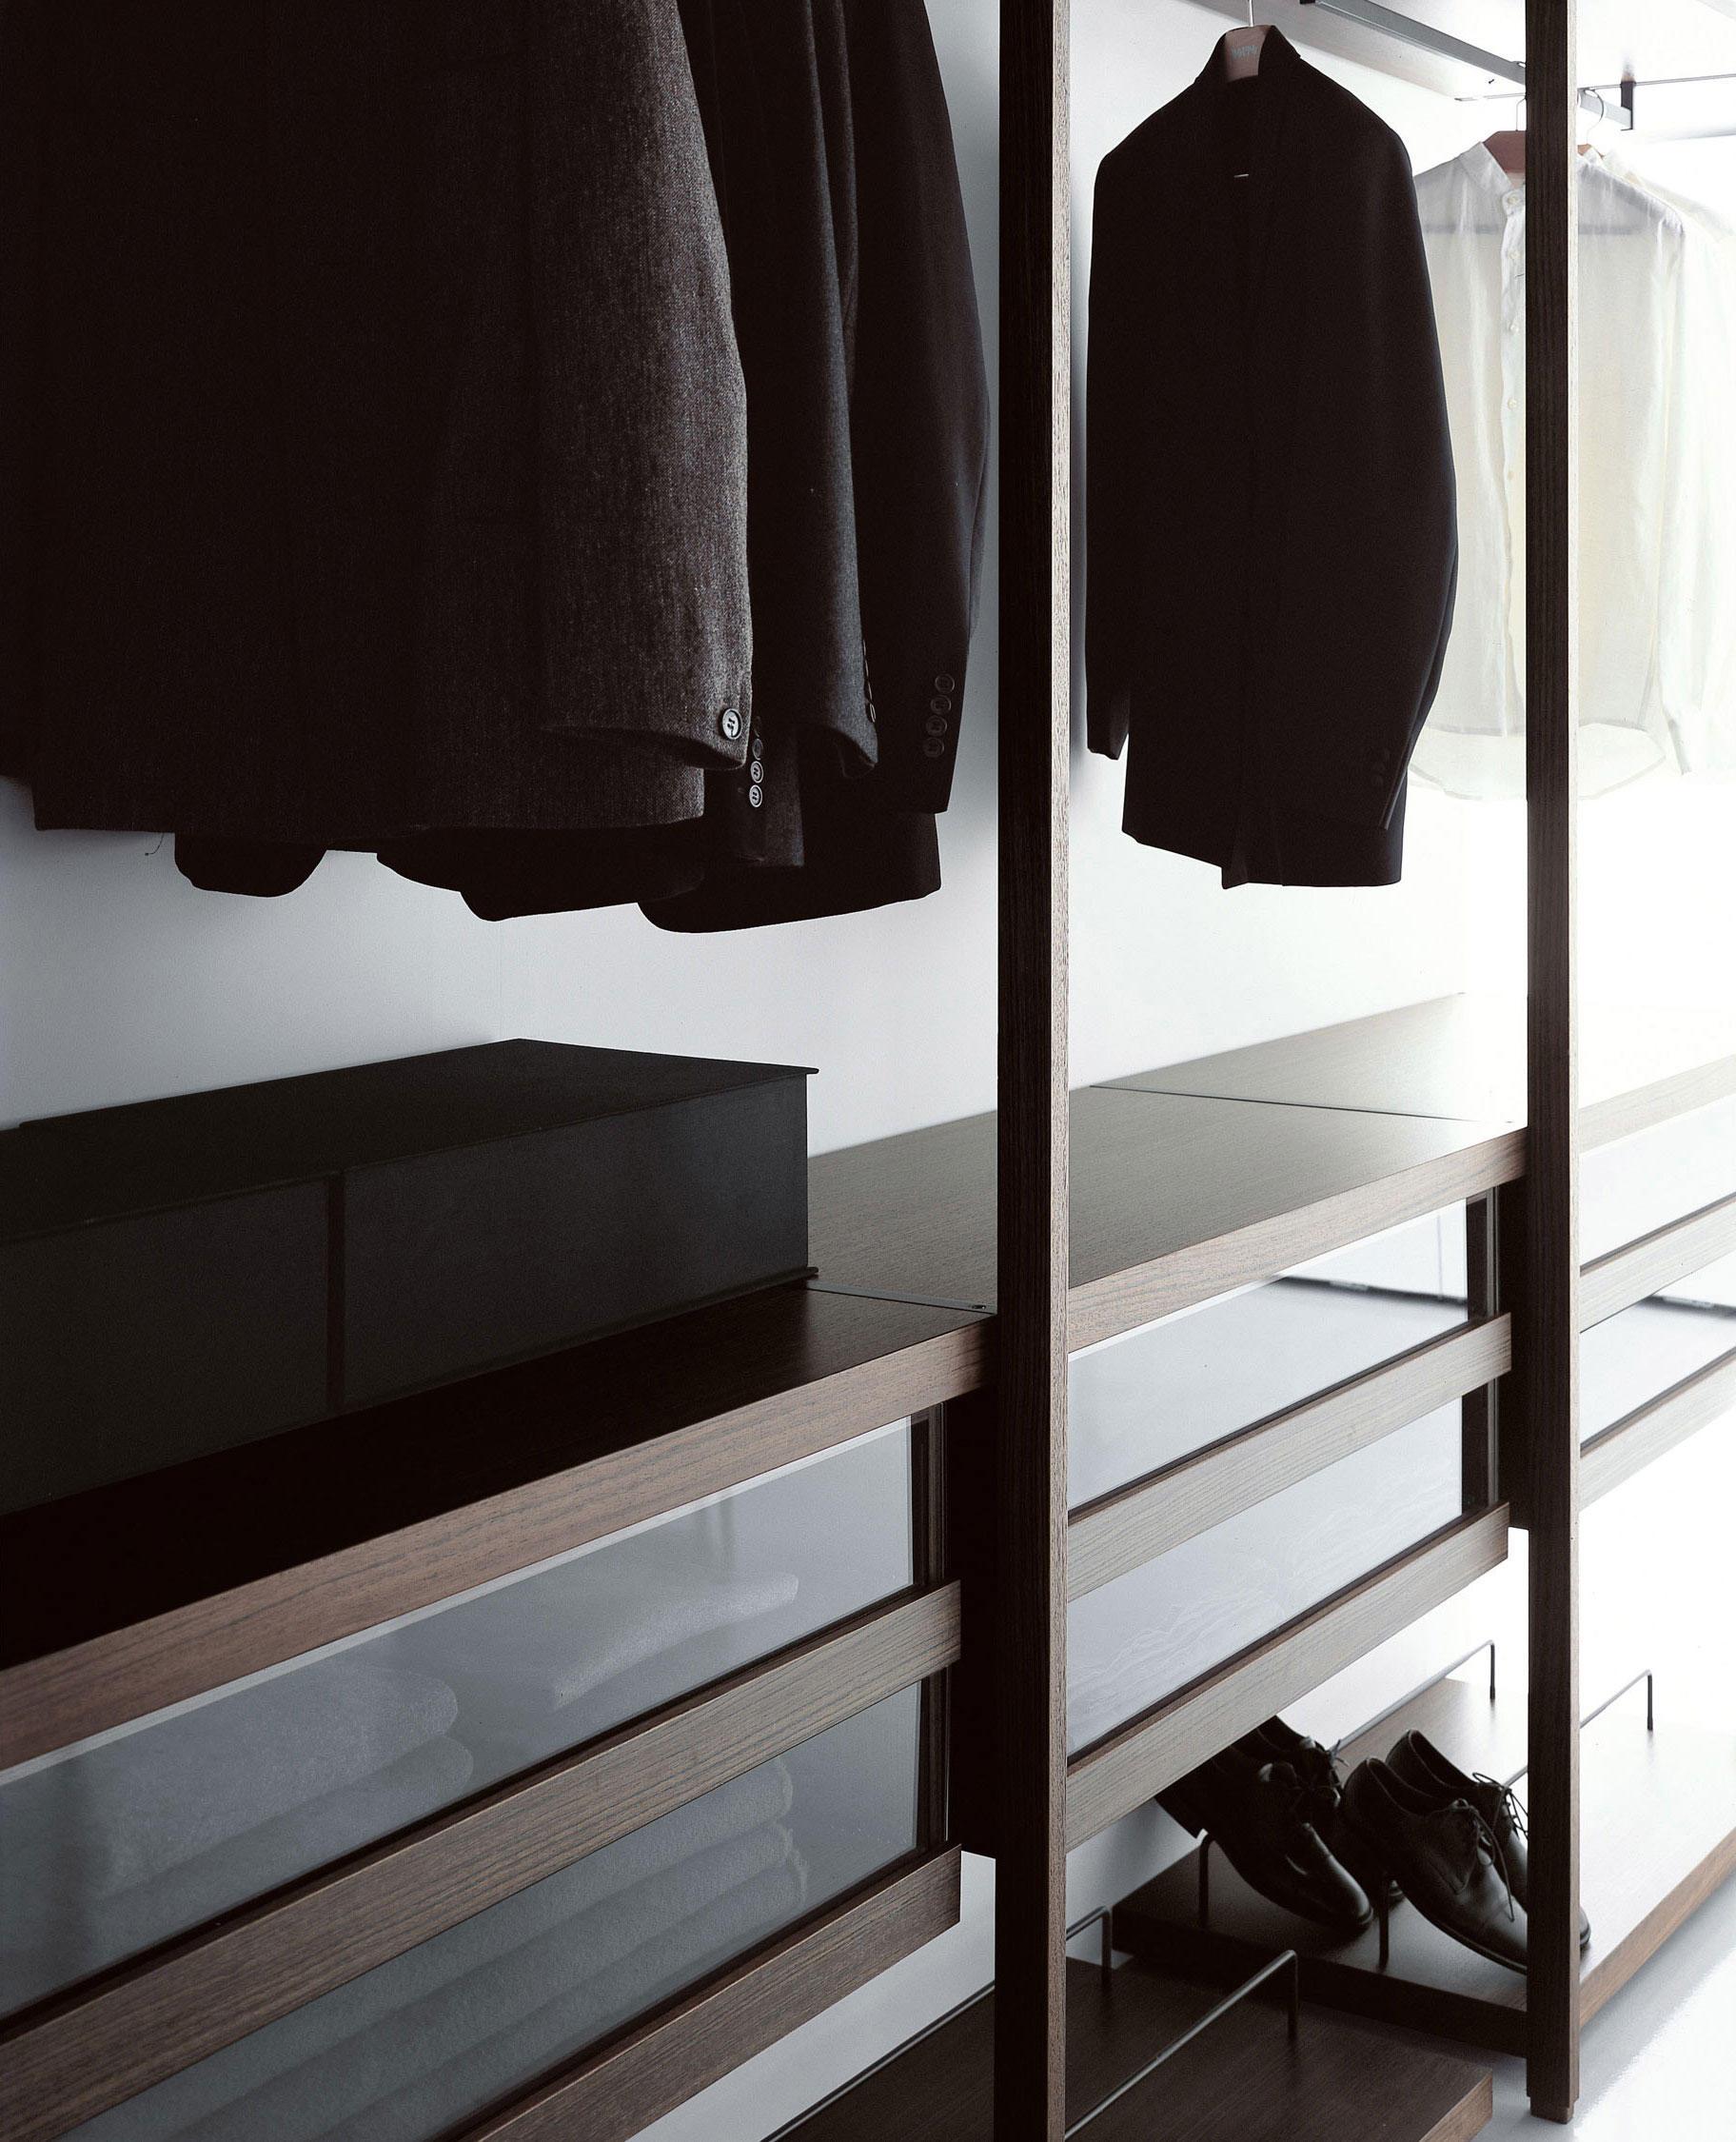 cabina armadio offerte: armadi blog arredamento part 3. ubik ... - Cabina Armadio Offerta